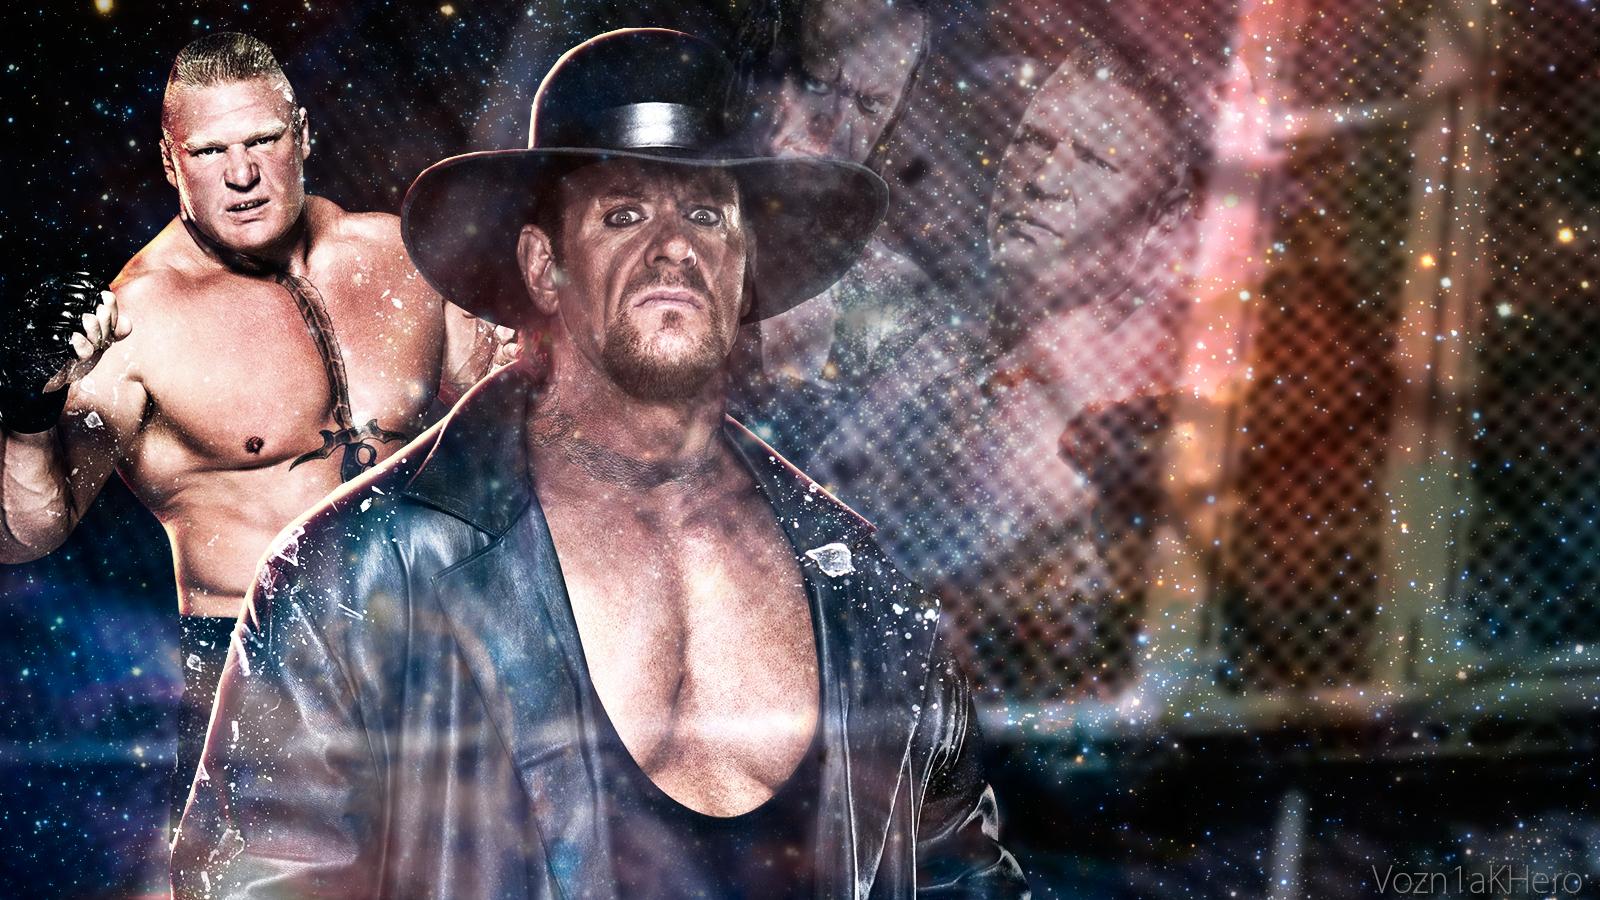 The Undertaker Vs Brock Lesnar HIAC Match 2015 Wp By Vozn1akHero